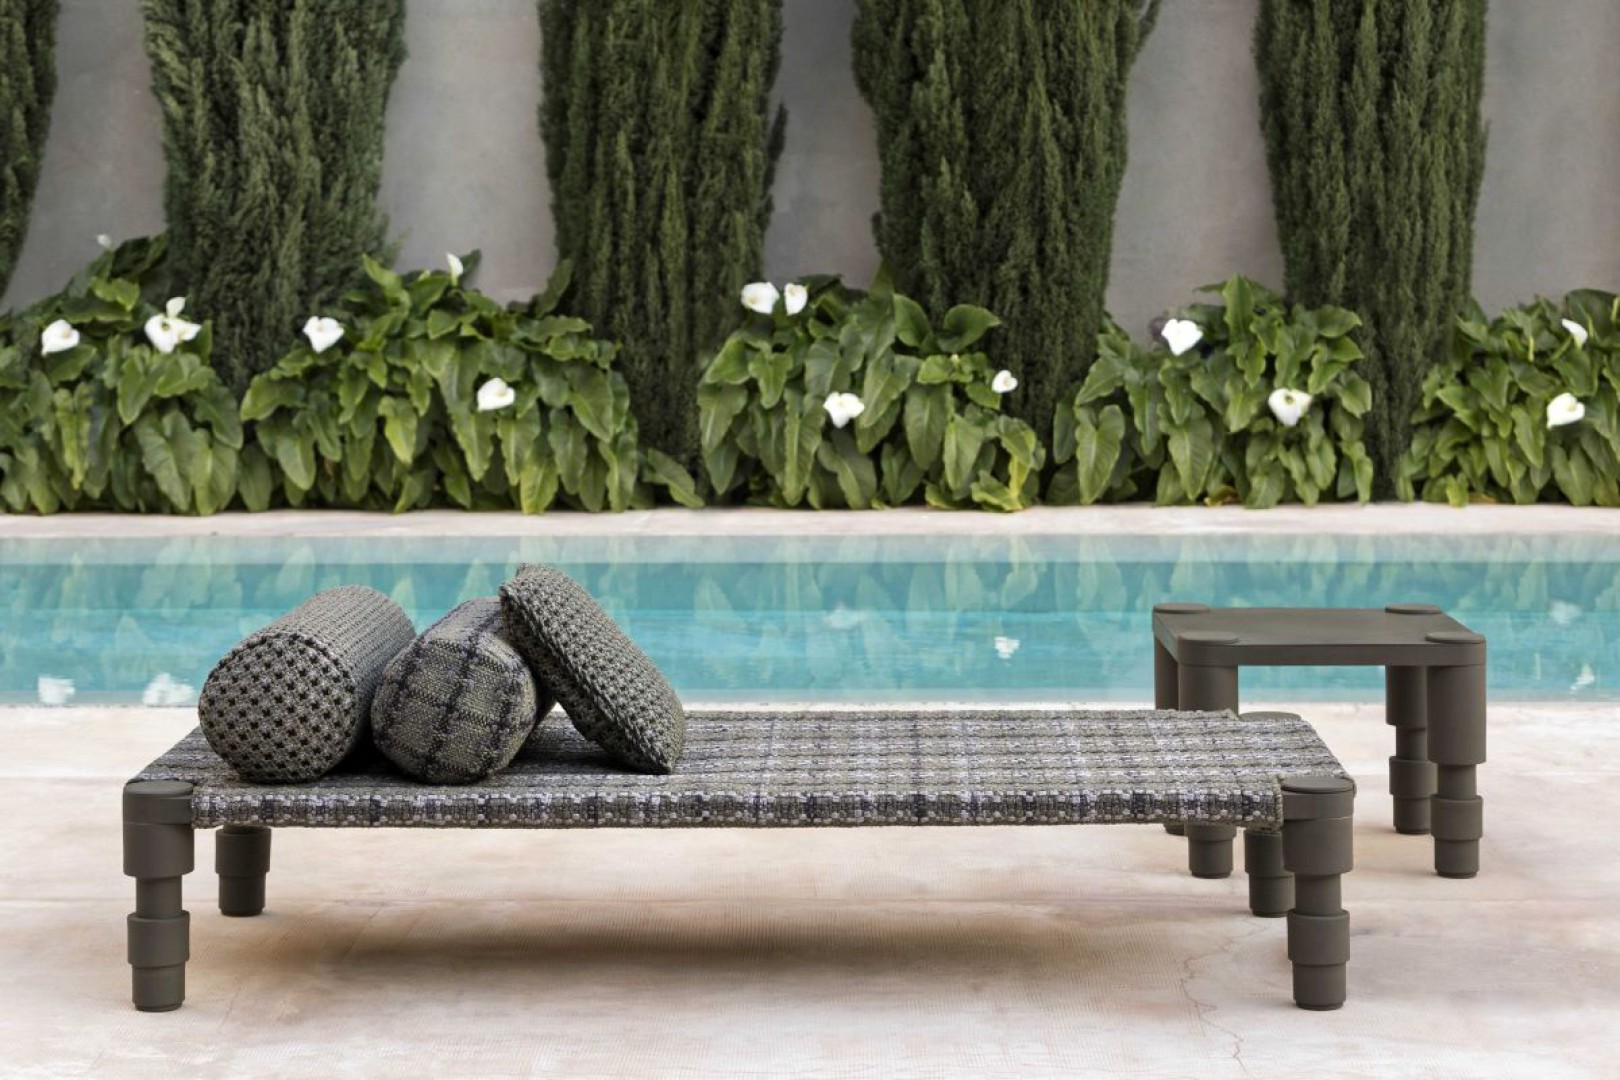 Leżak z kolekcji Garden Layers marki Gan. Projekt: Patricia Urquiola. Fot. Gan